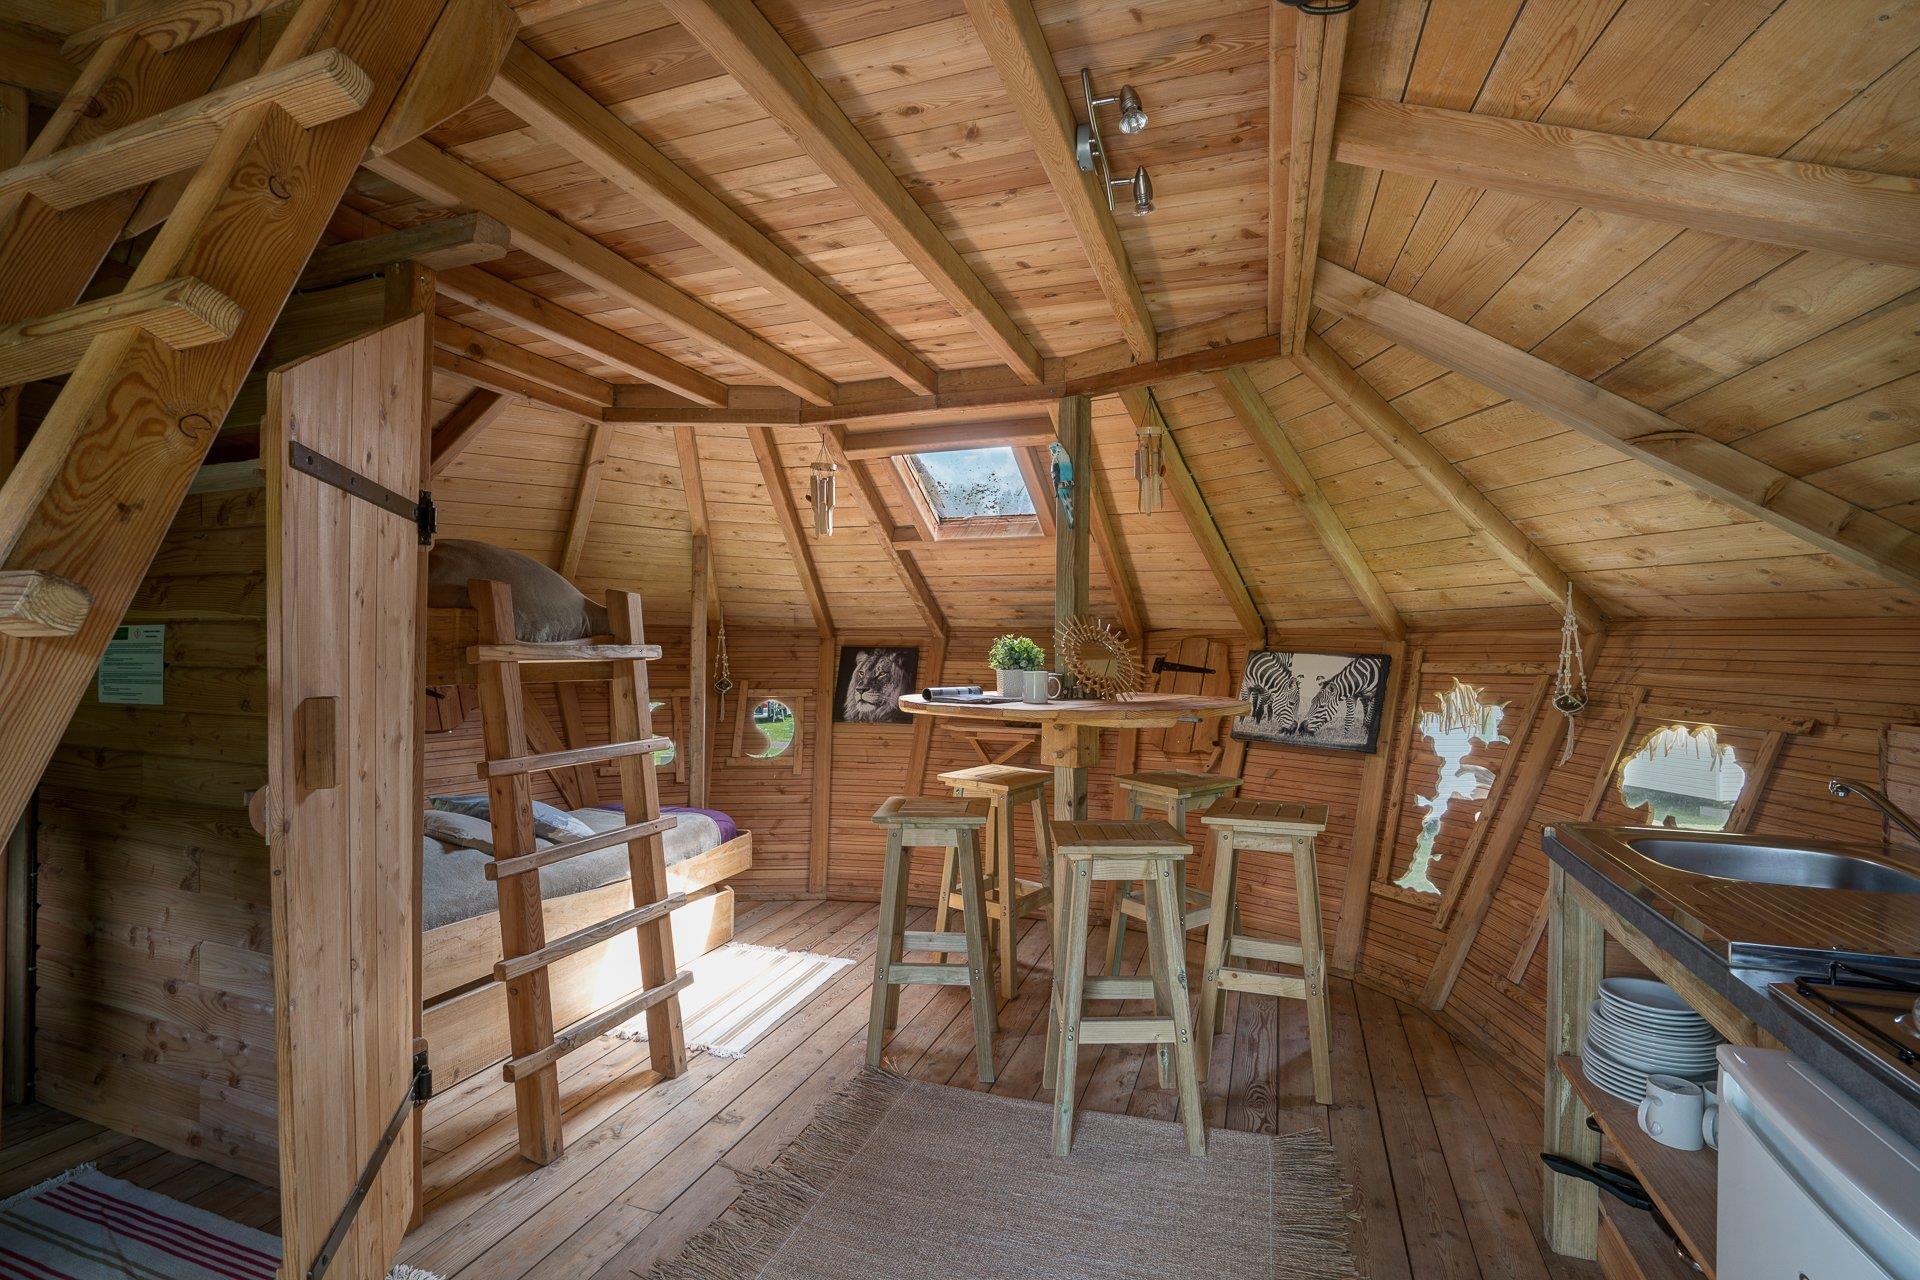 Location - Cabane Savana 2 Chambres - Camping Sandaya Paris Maisons-Laffitte